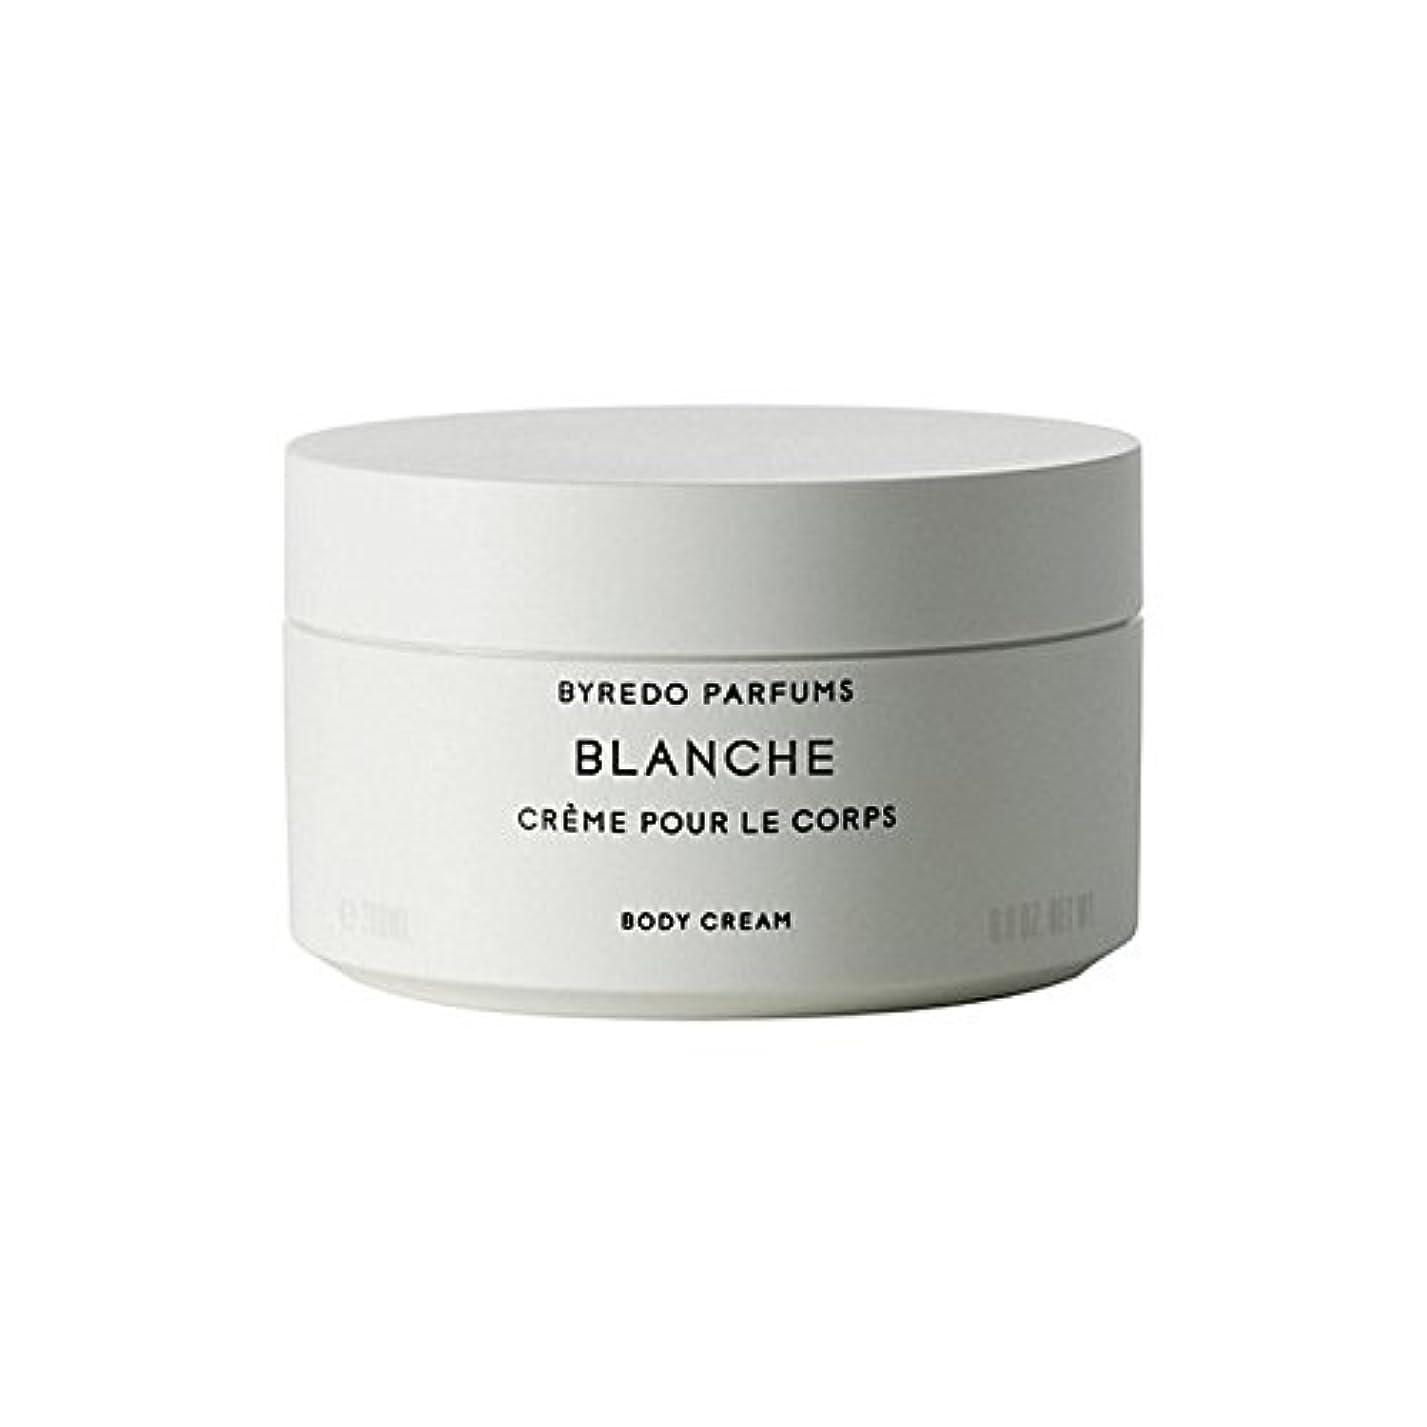 Byredo Blanche Body Cream 200ml (Pack of 6) - ブランシュボディクリーム200ミリリットル x6 [並行輸入品]